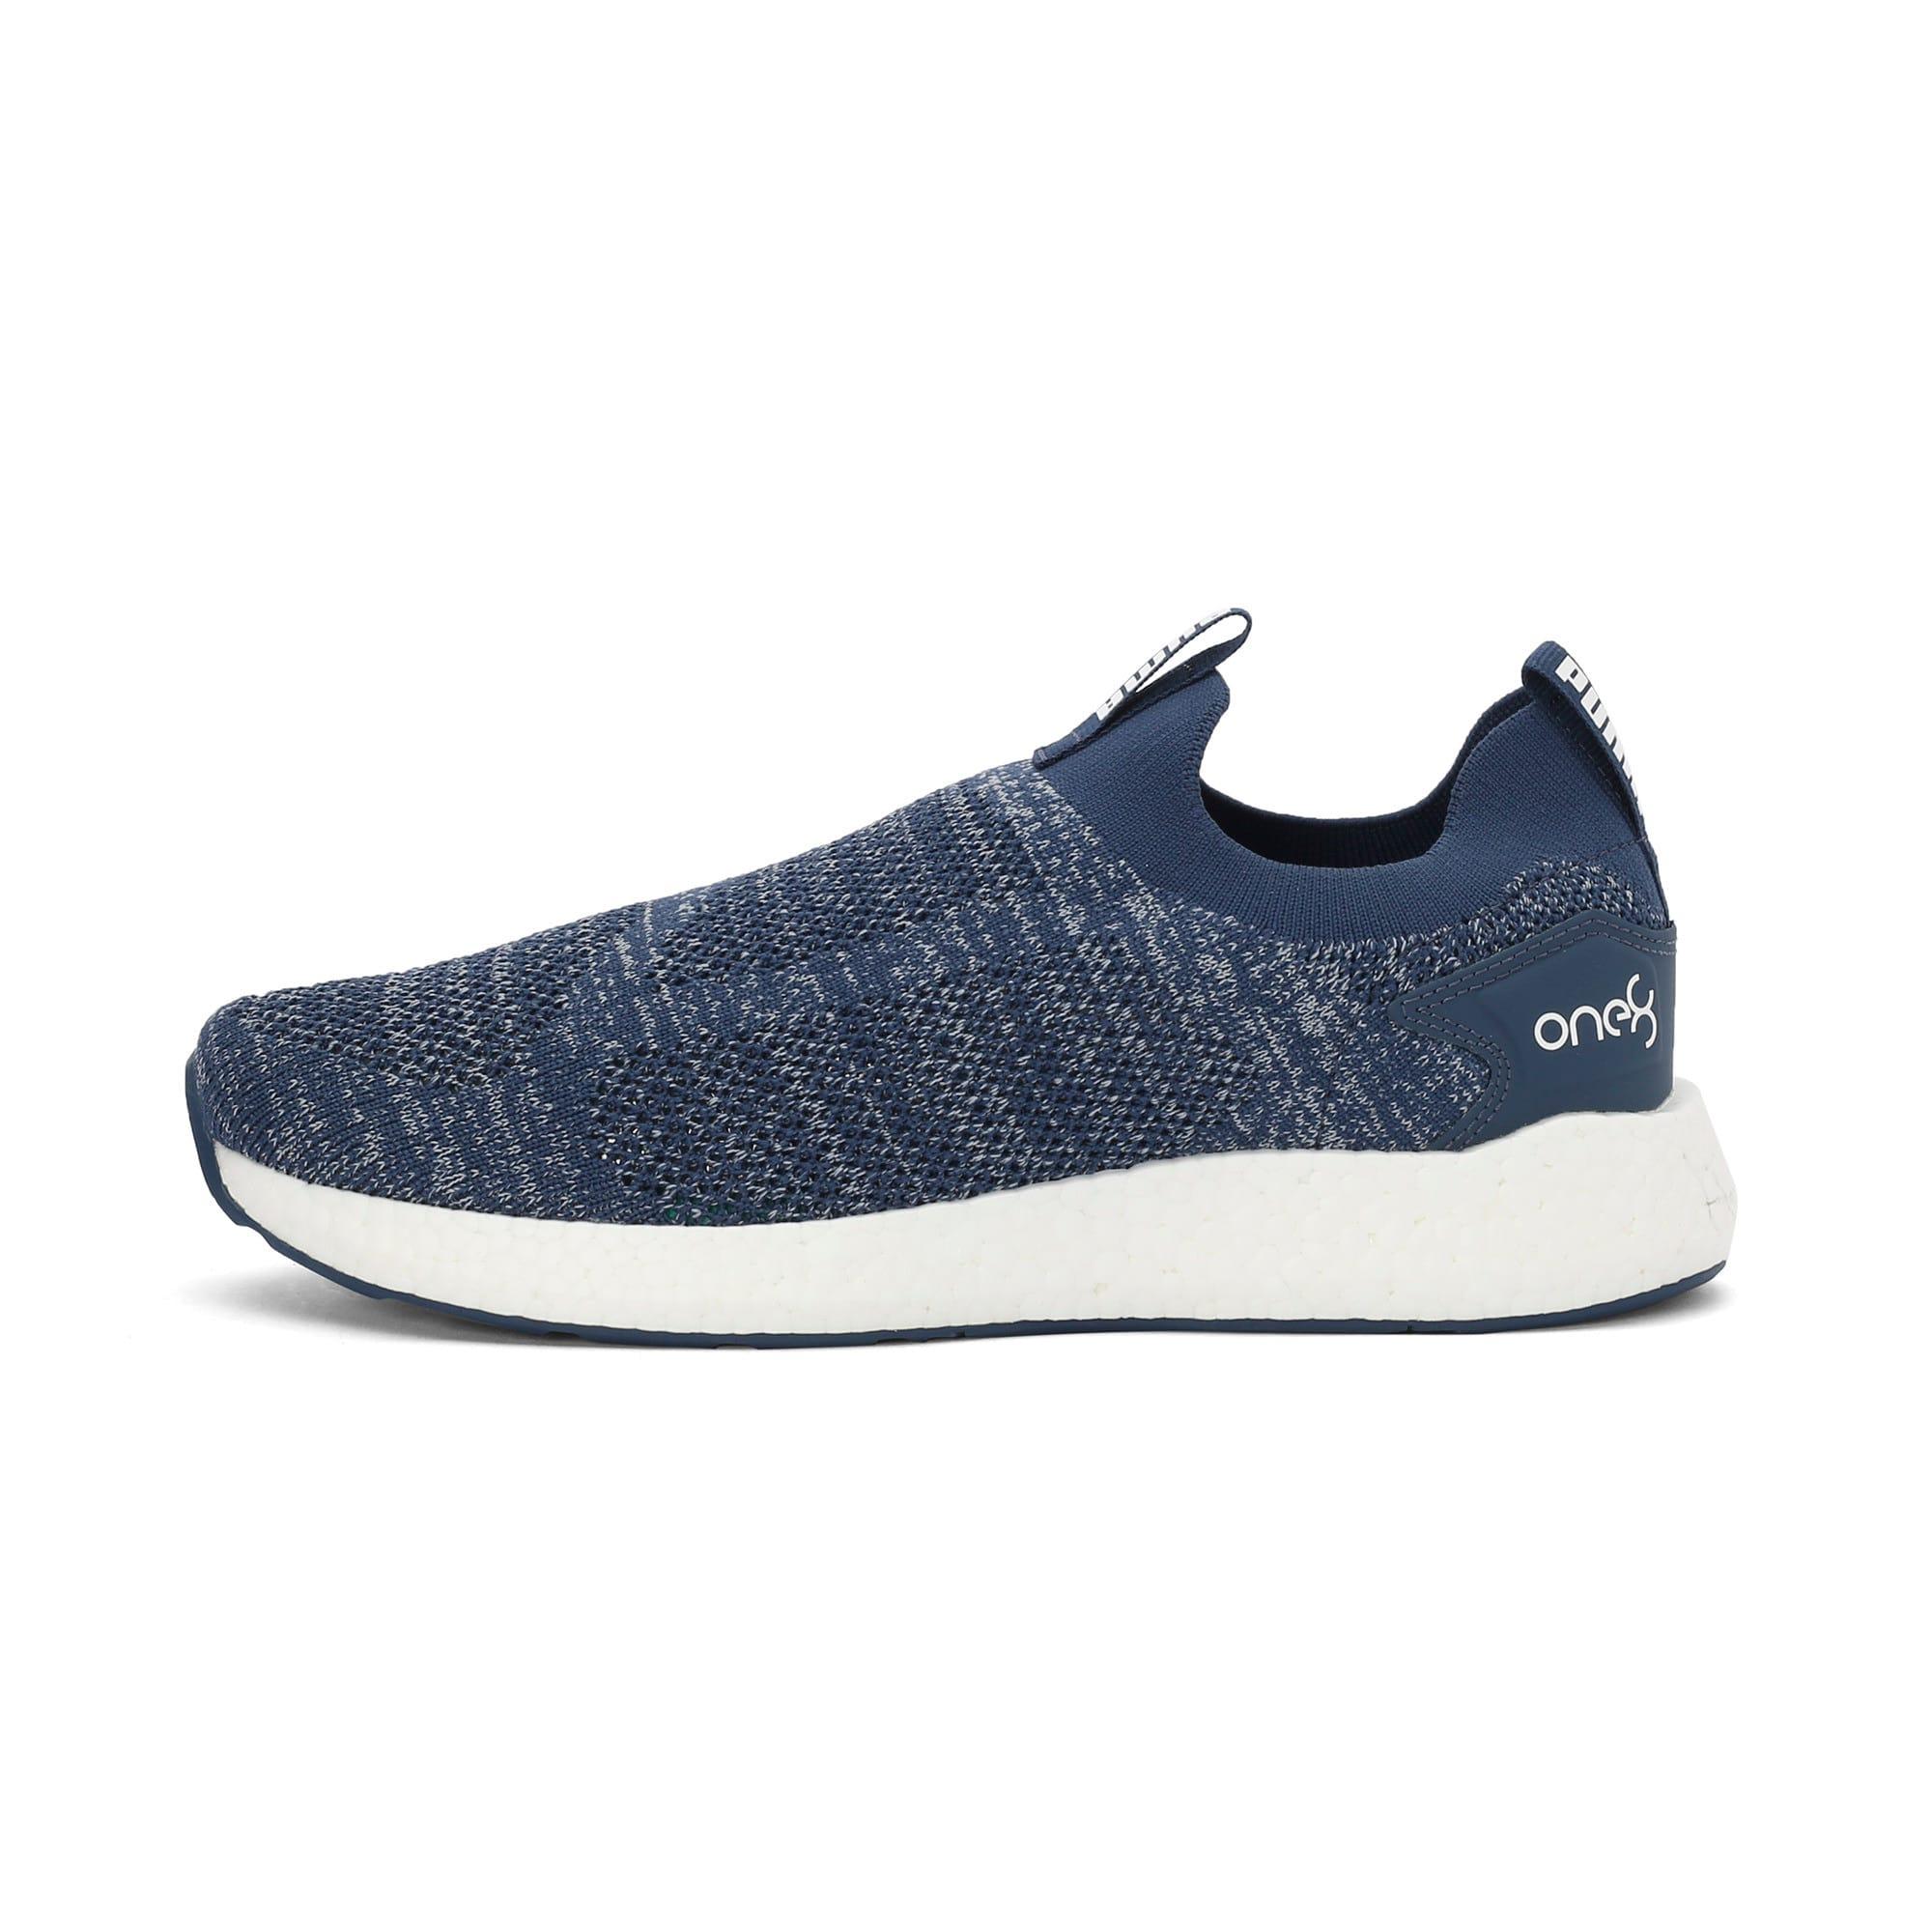 Thumbnail 1 of NRGY Neko Slip-On one8 Unisex Running Shoes, Dark Denim-Puma White, medium-IND